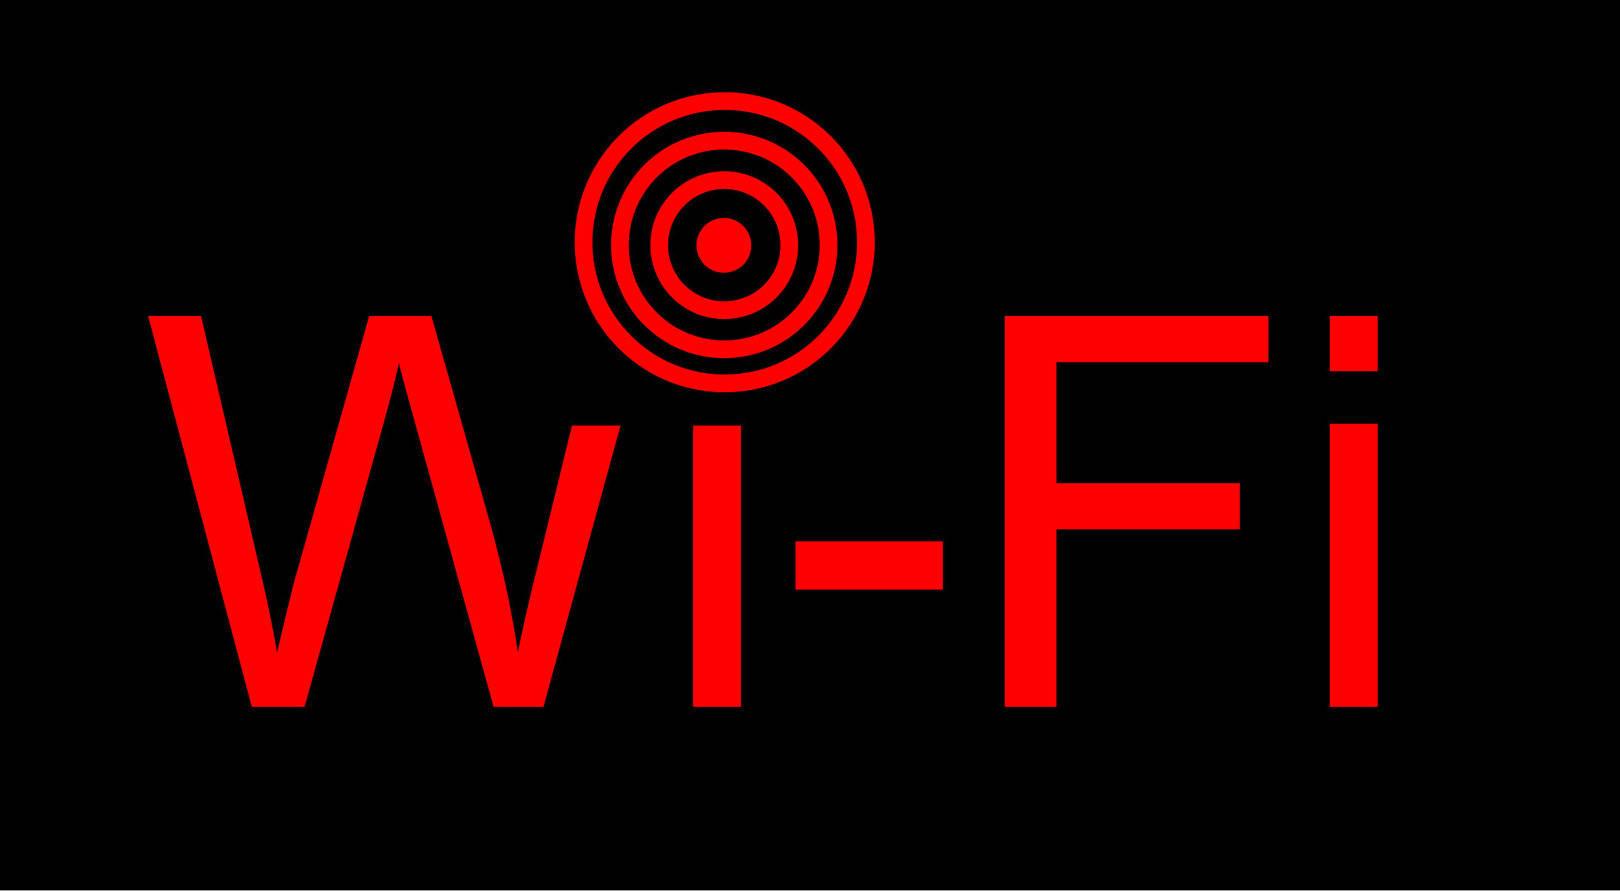 зона Wi-Fi для моей школы)